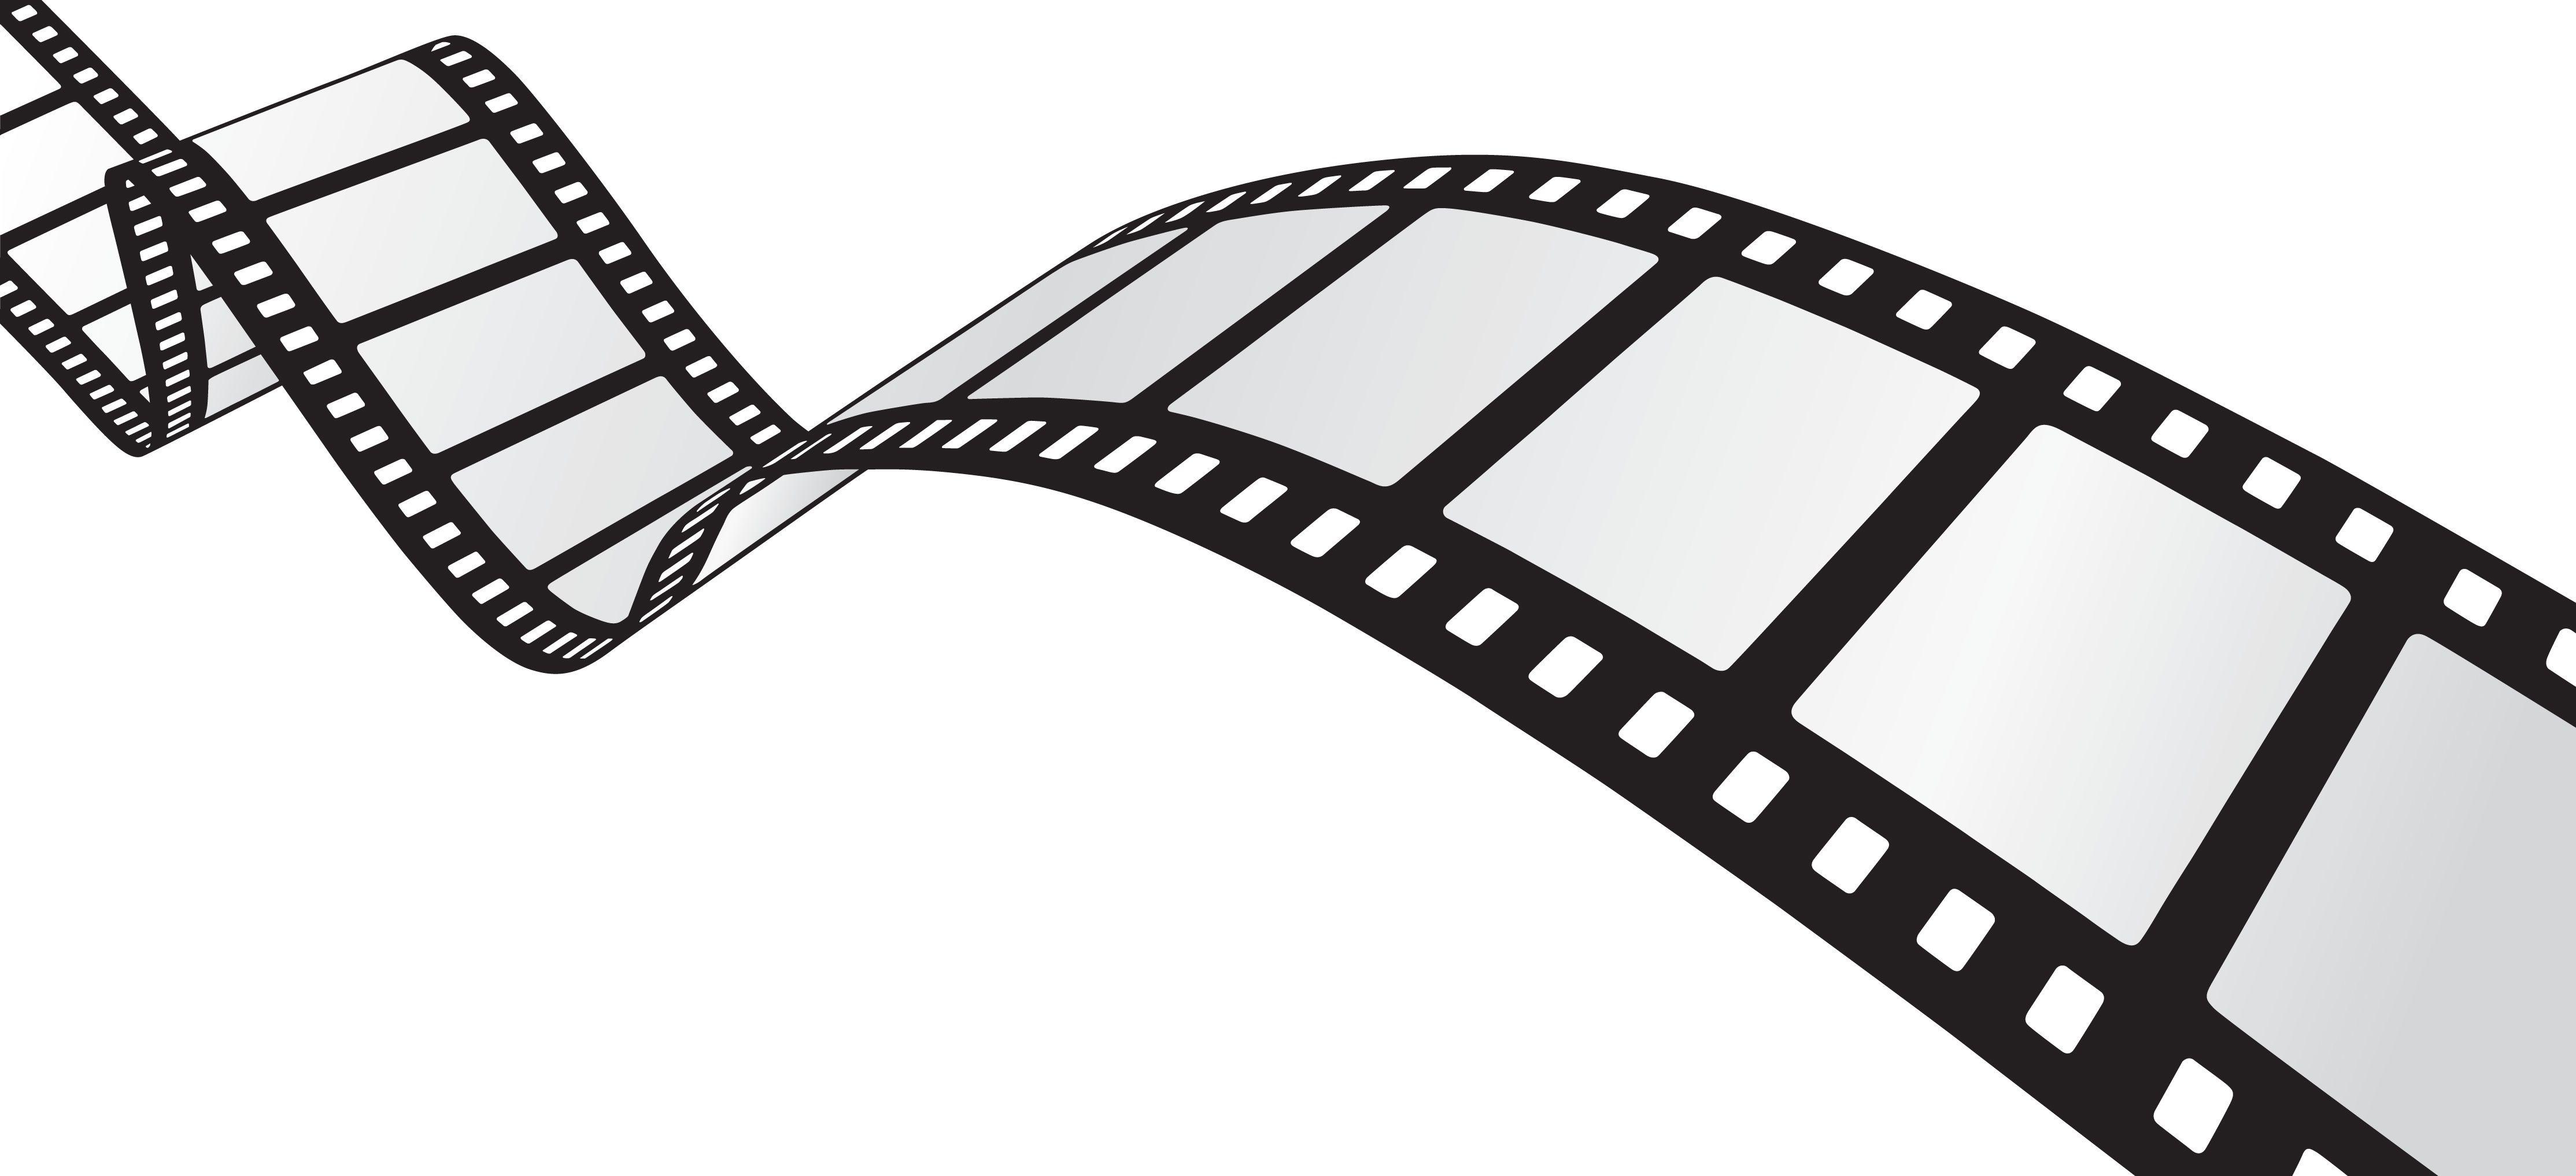 clipart free download Reel clipart. Pics for film reels.